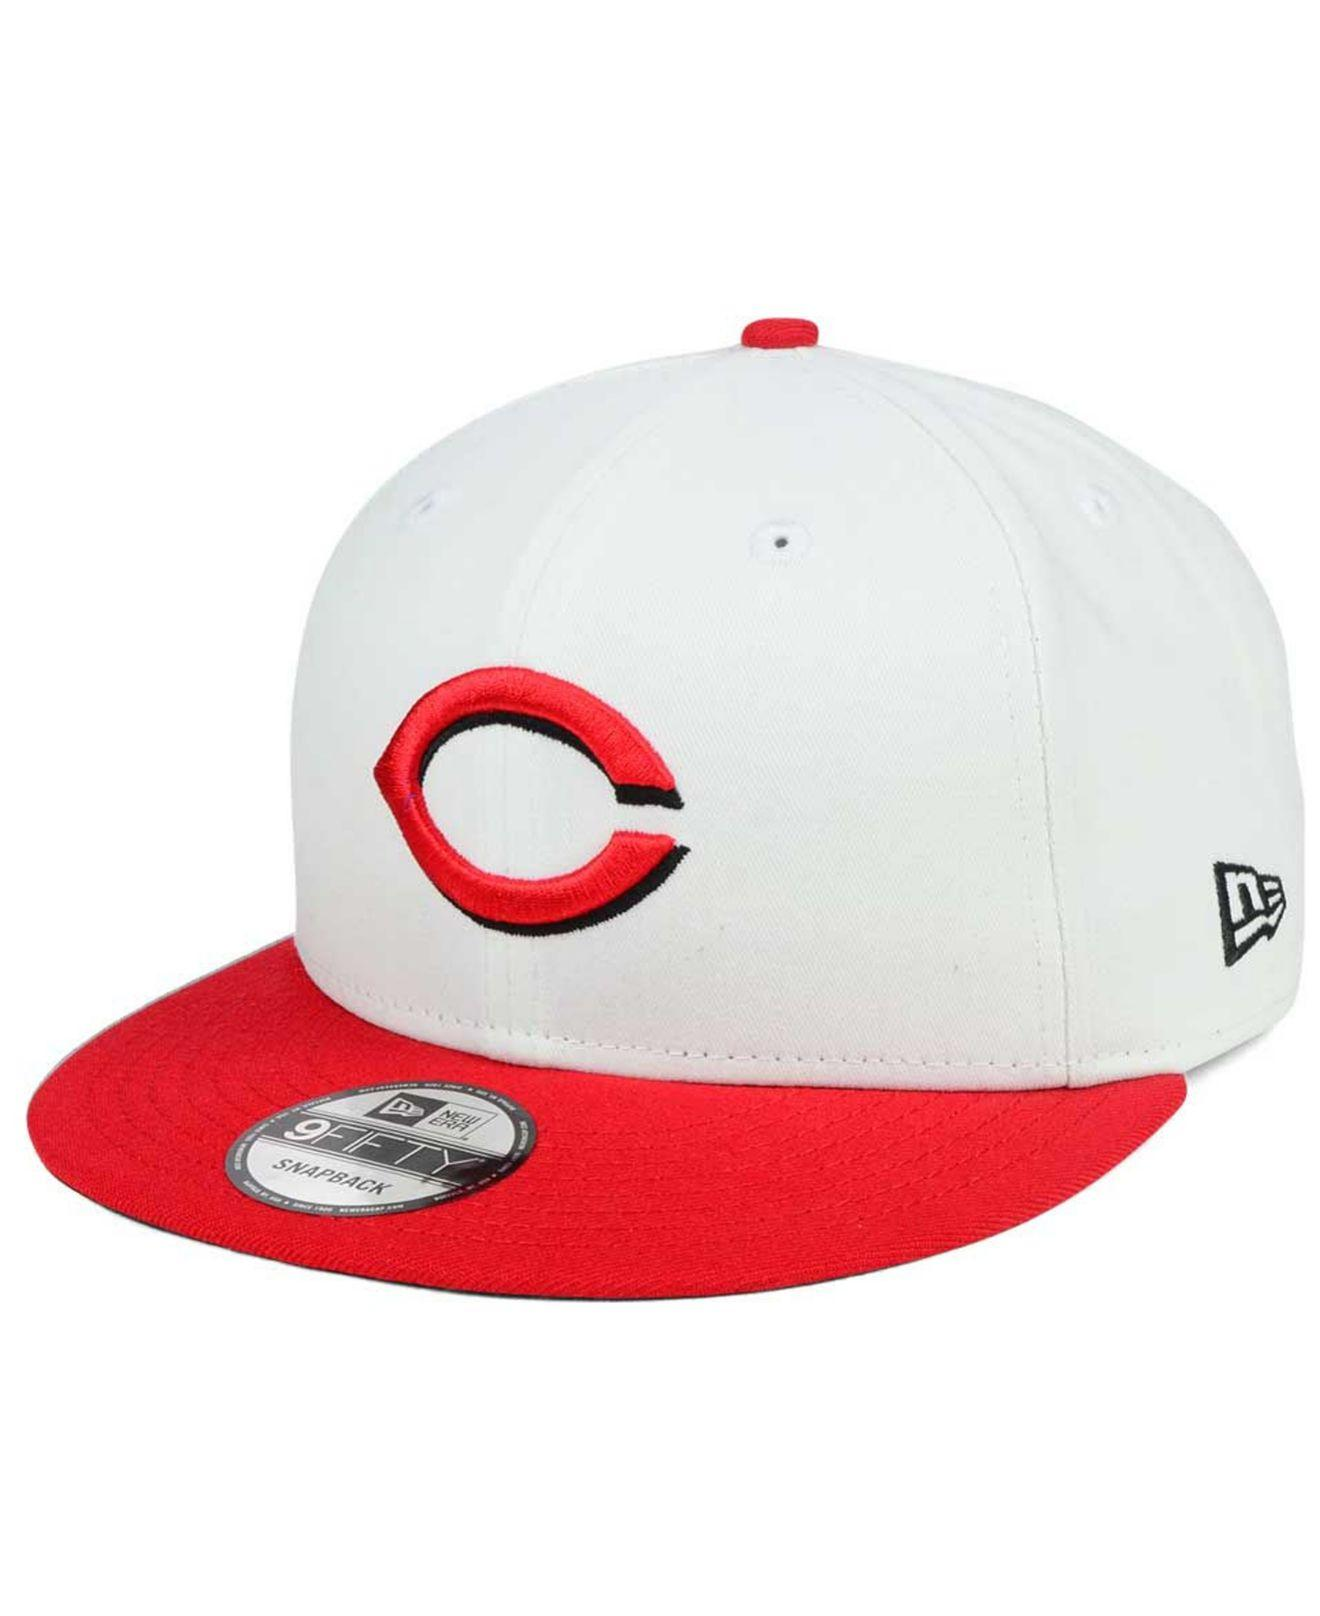 new style 3f9d8 d0859 Lyst - Ktz All Shades 9fifty Snapback Cap for Men